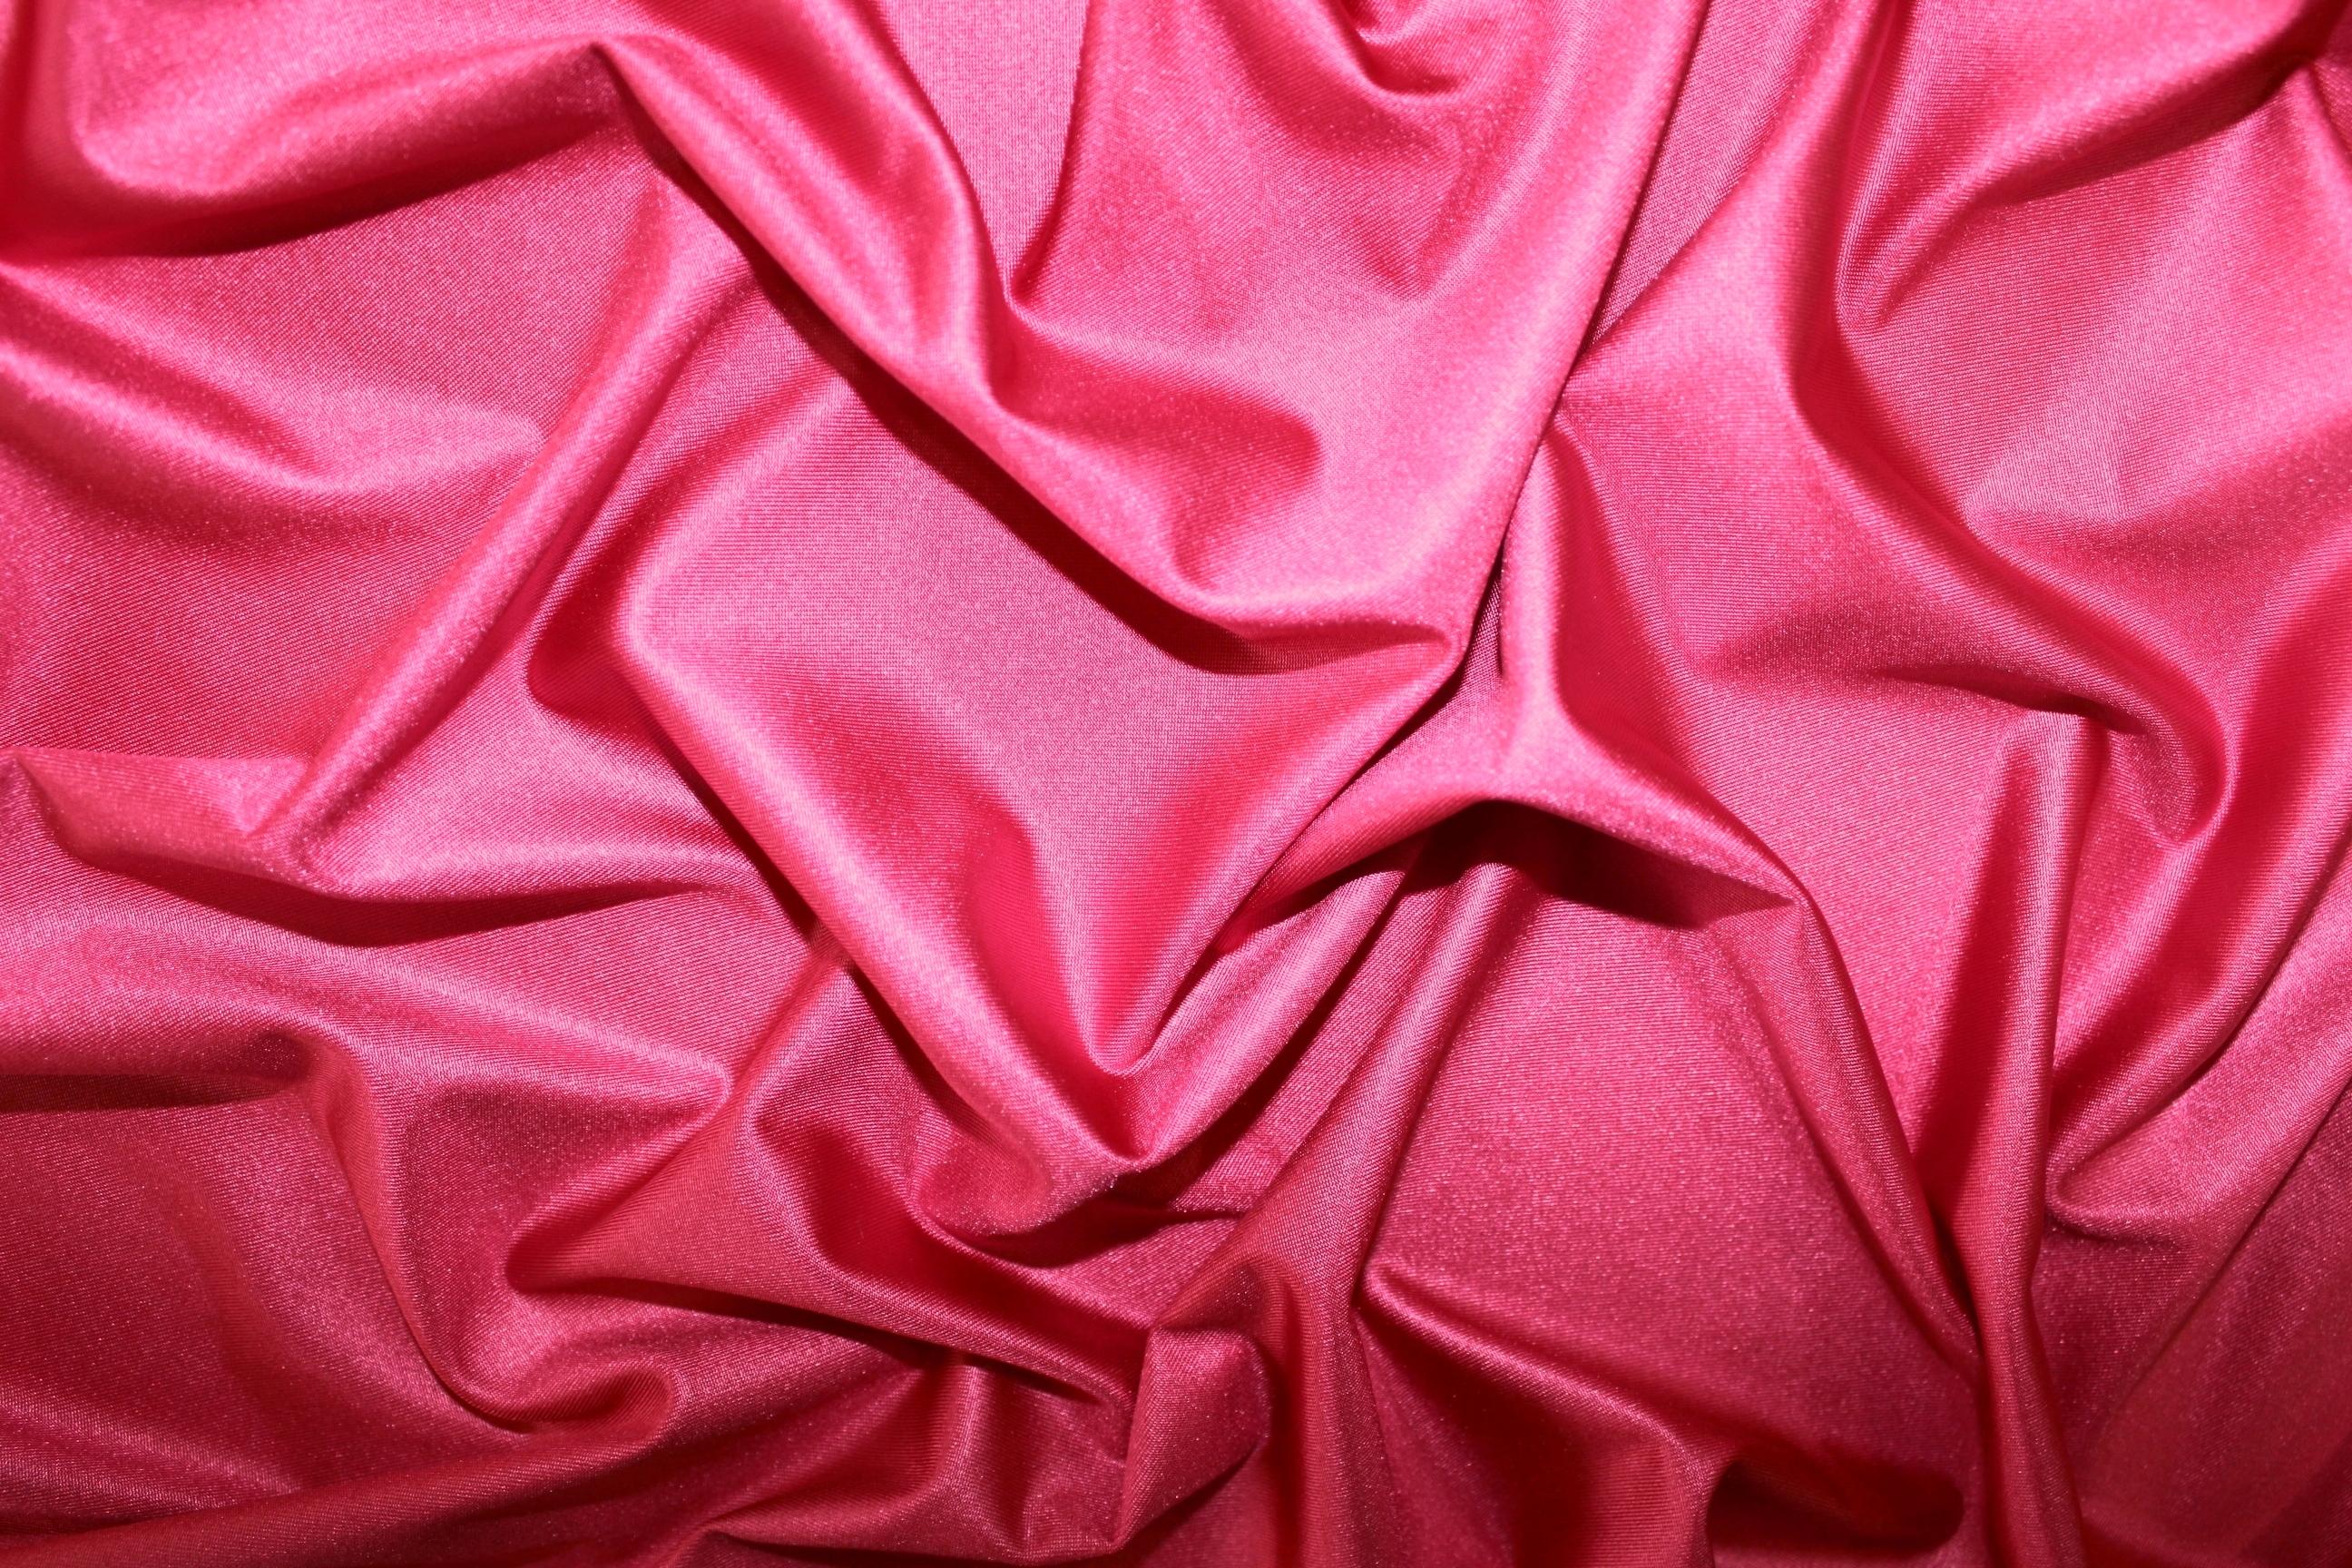 2570bae5881c Трикотаж масло под кожу, цвет насыщенный розовый, Арт.104/10-HLC C ...